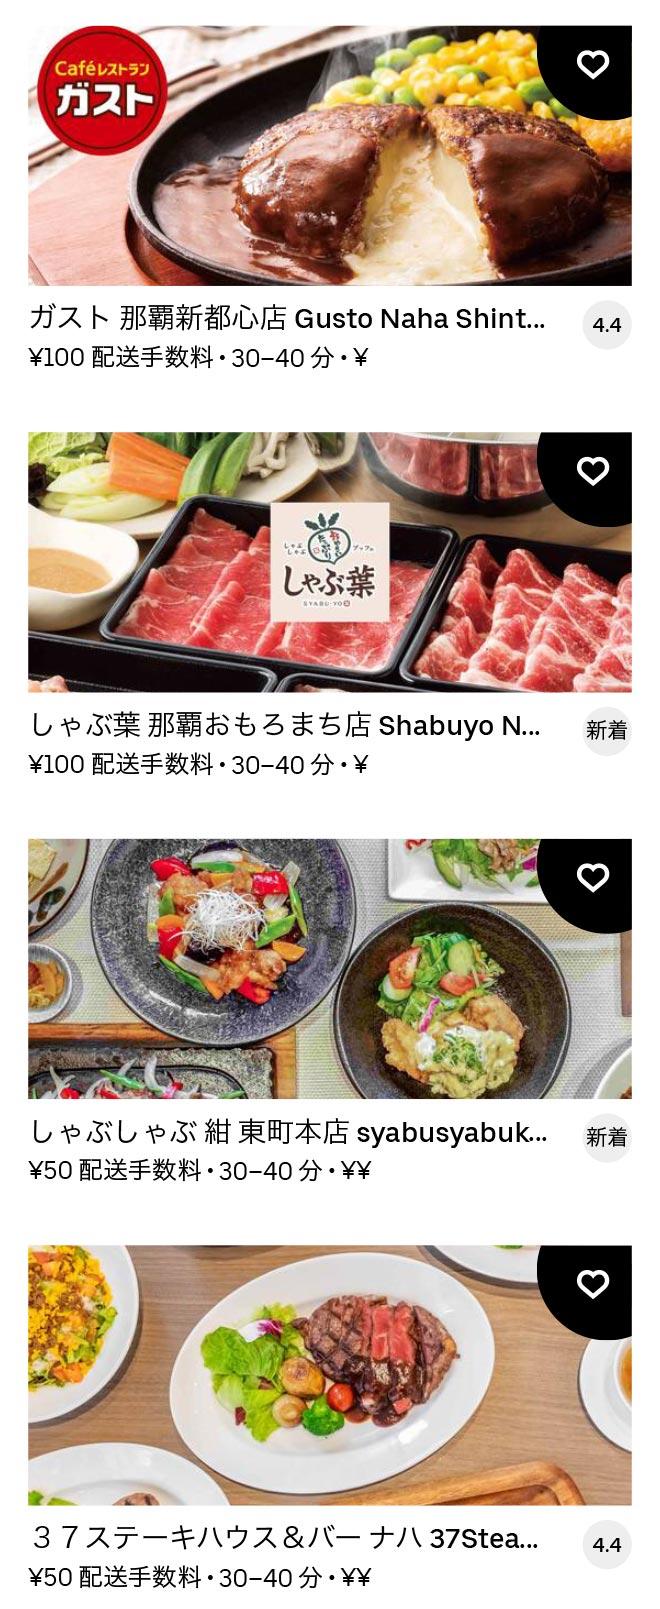 O kenchomae menu 2011 12